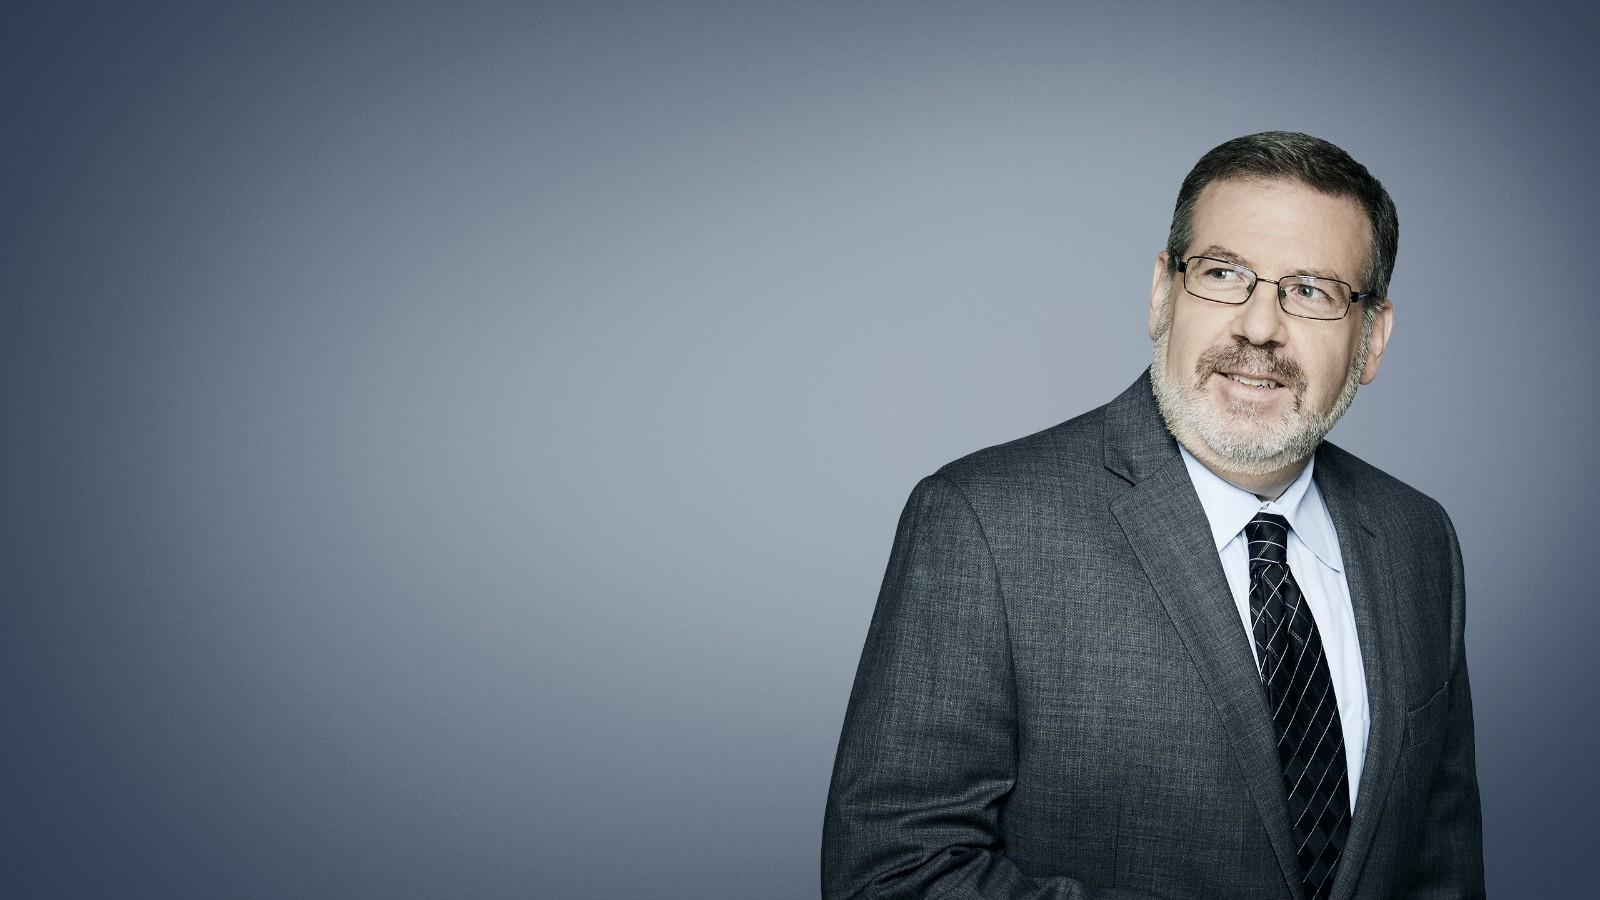 CNN Profiles - Brian Lowry - Senior Writer, CNN Media and